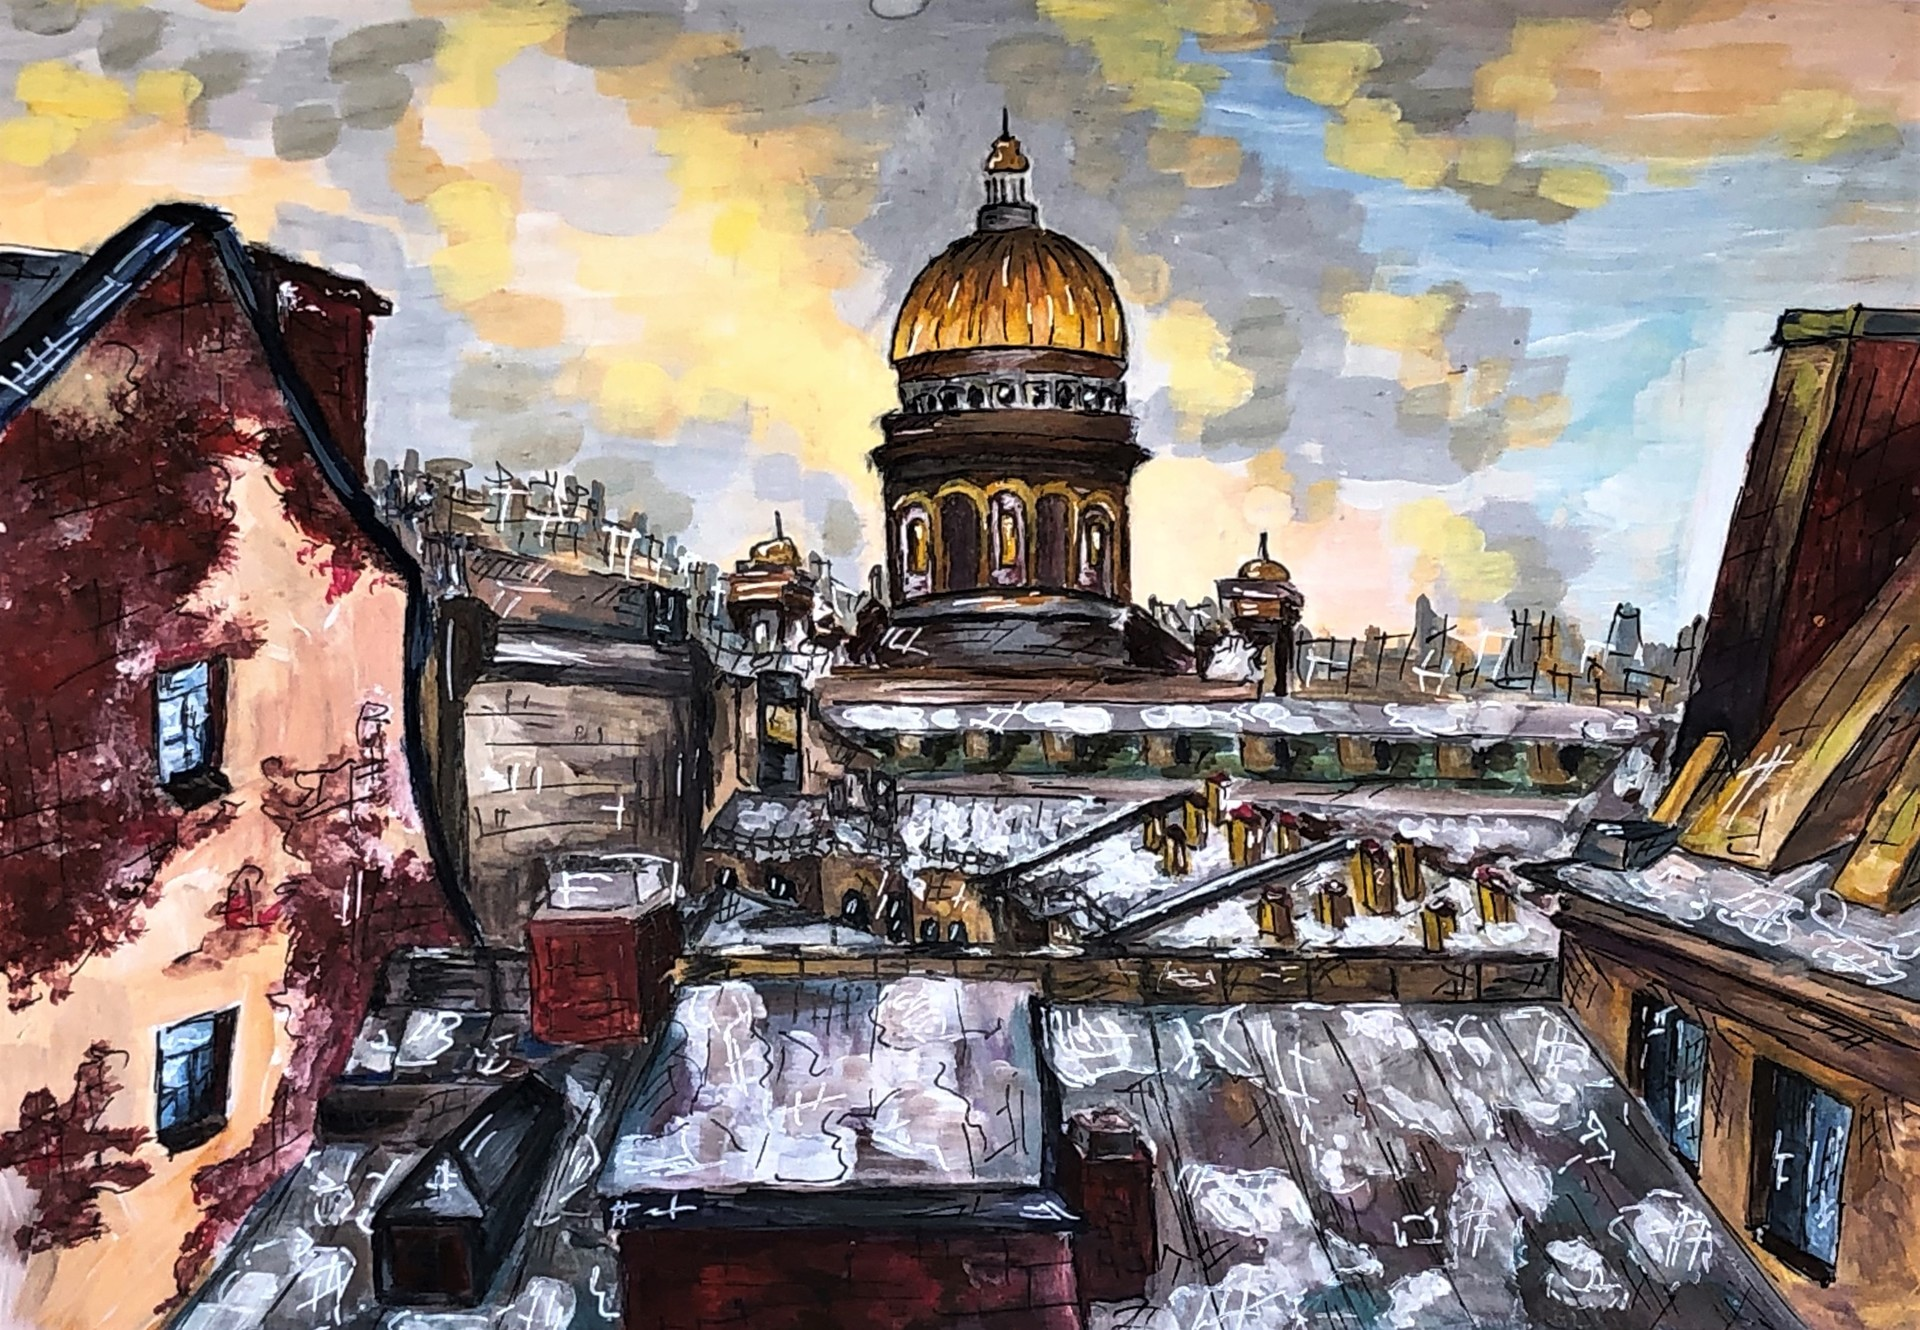 Nadezhda Konyukhova, 15 anni. Vista sulla cattedrale di Sant'Isacco, Mosca, 2020. Scuola d'arte E. F. Svetlanov.